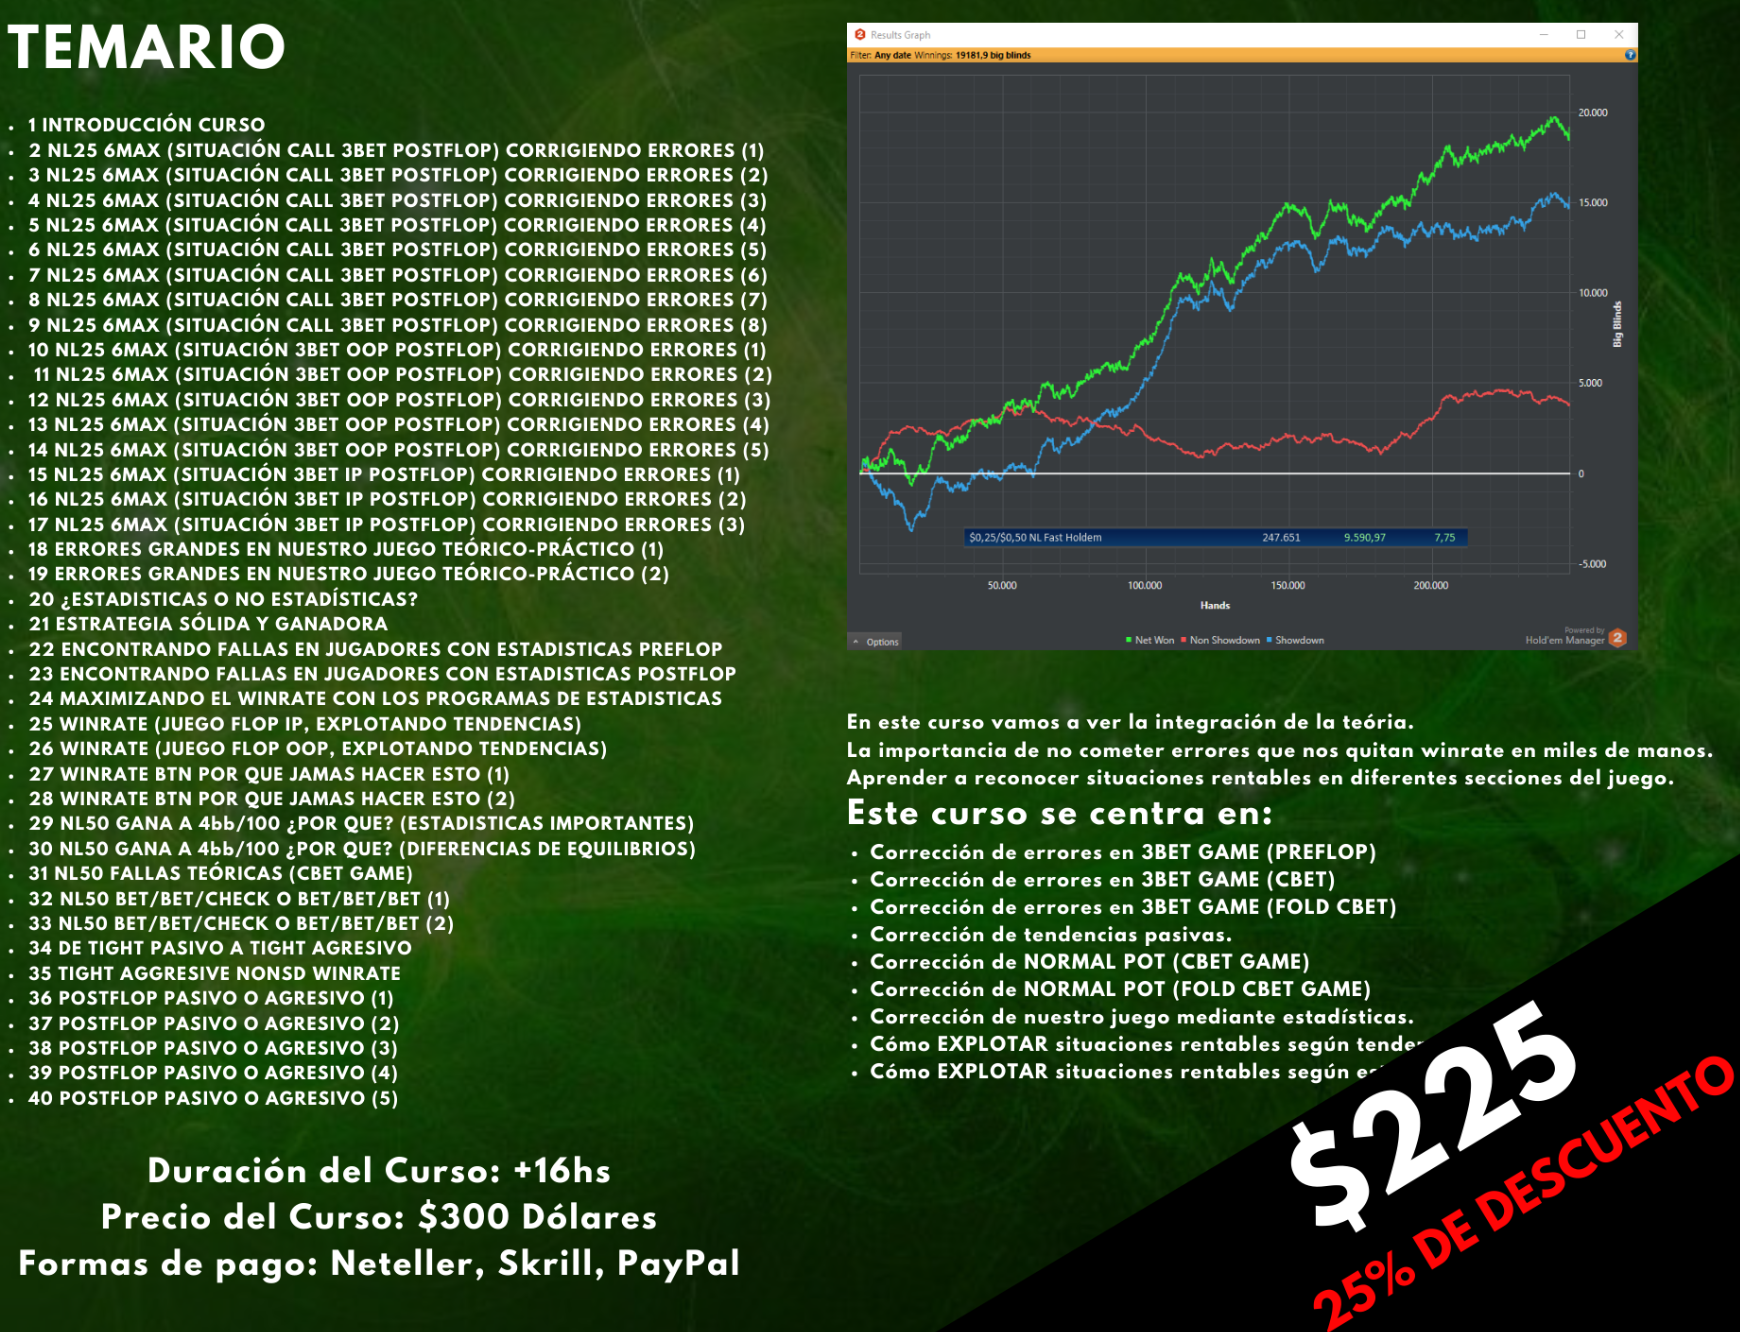 Curso Práctico Intermedio Poker - David Díaz